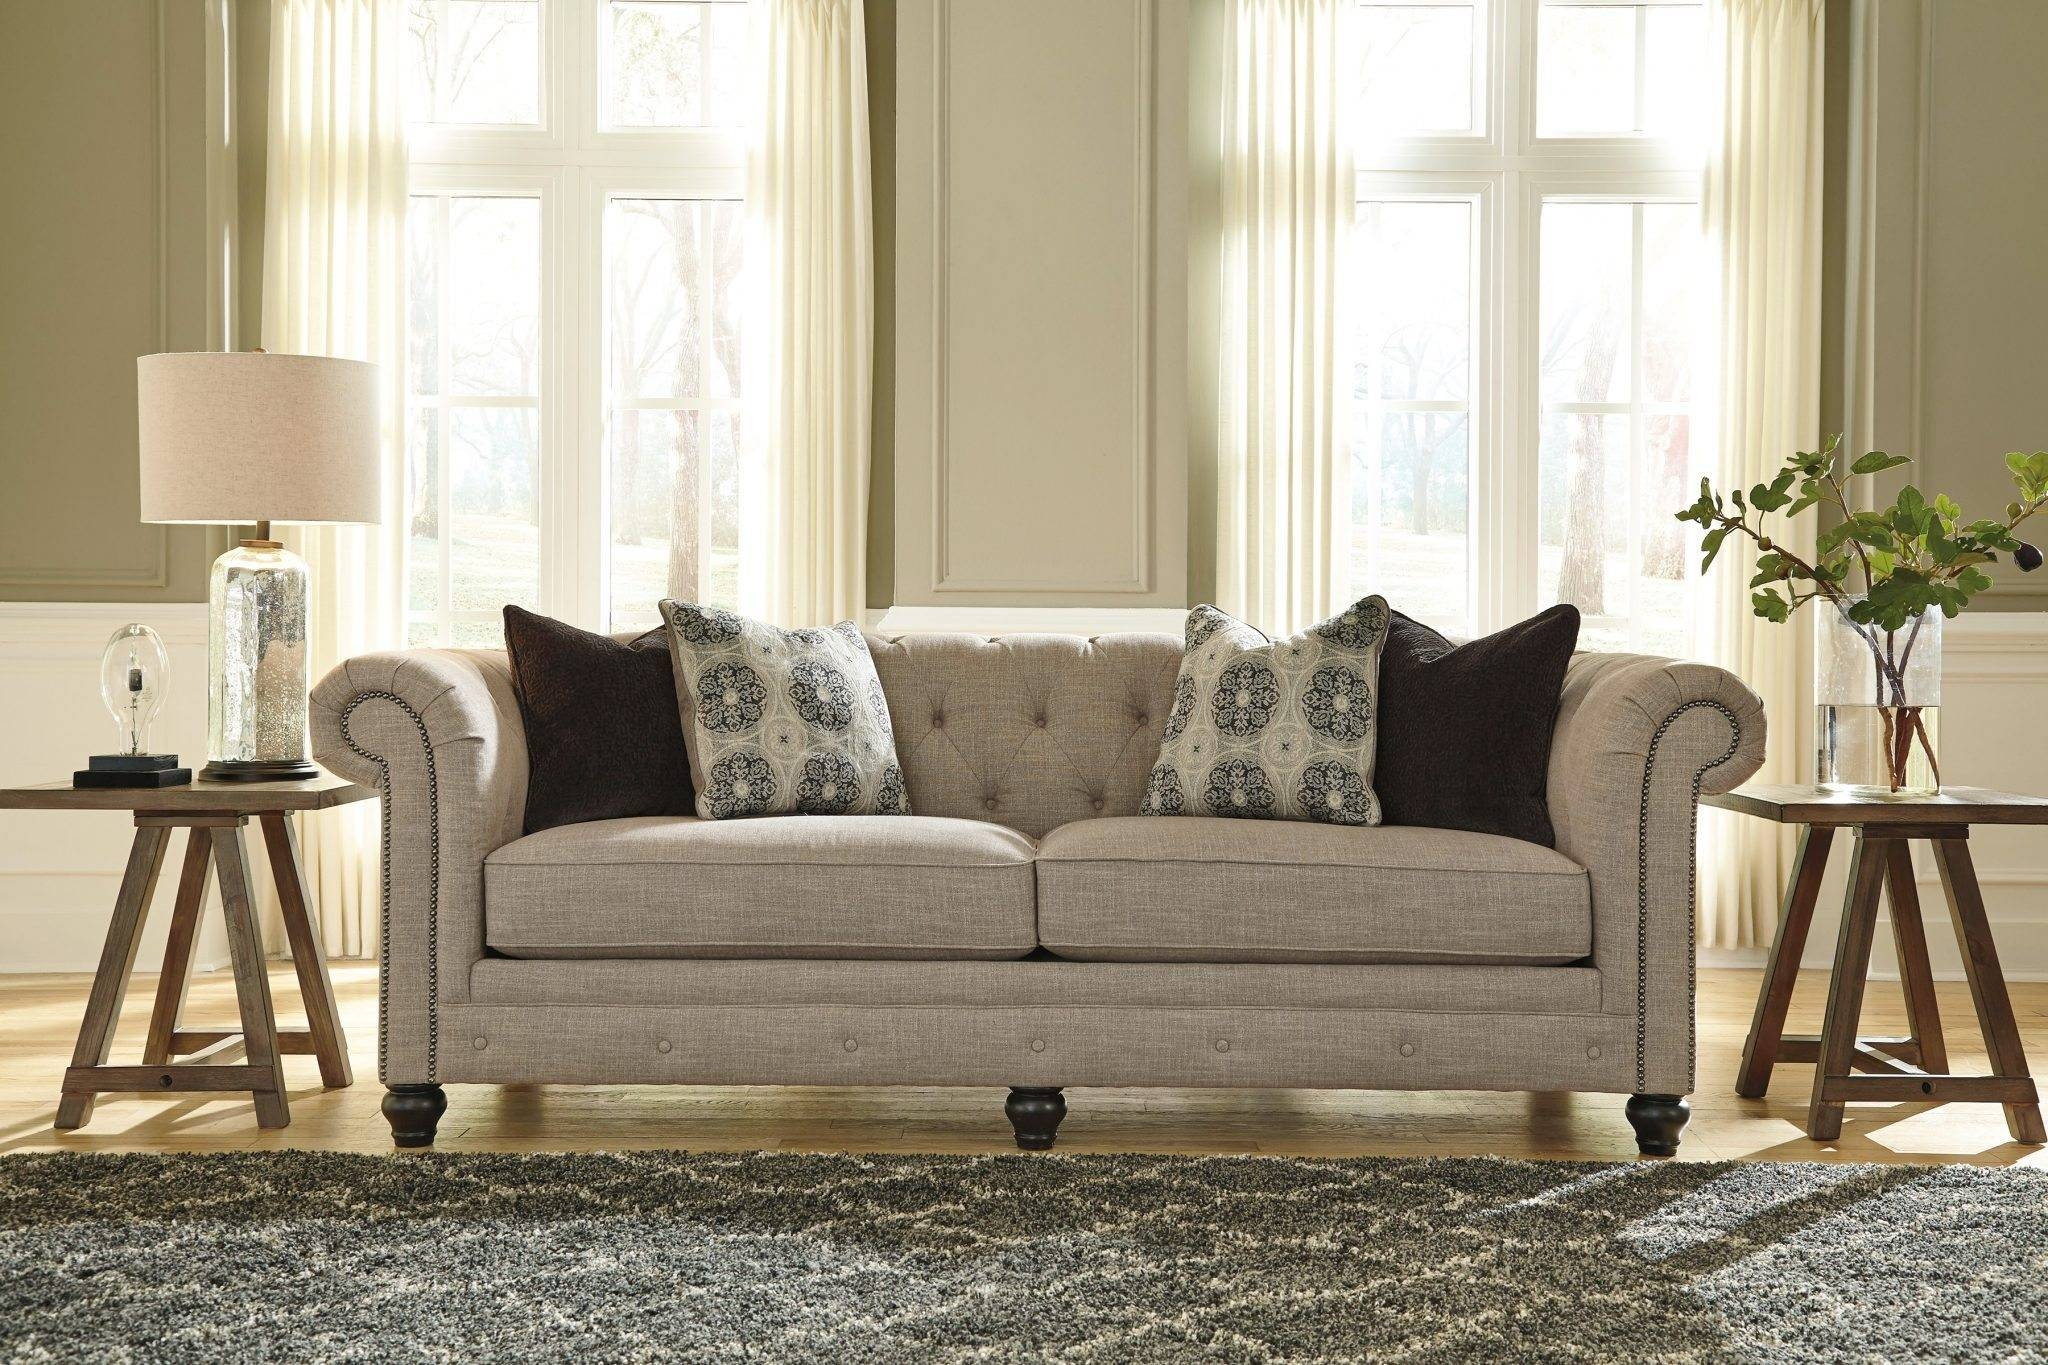 Best Furniture Mentor Oh: Furniture Store – Ashley Furniture Inside Ashley Tufted Sofa (Image 10 of 30)